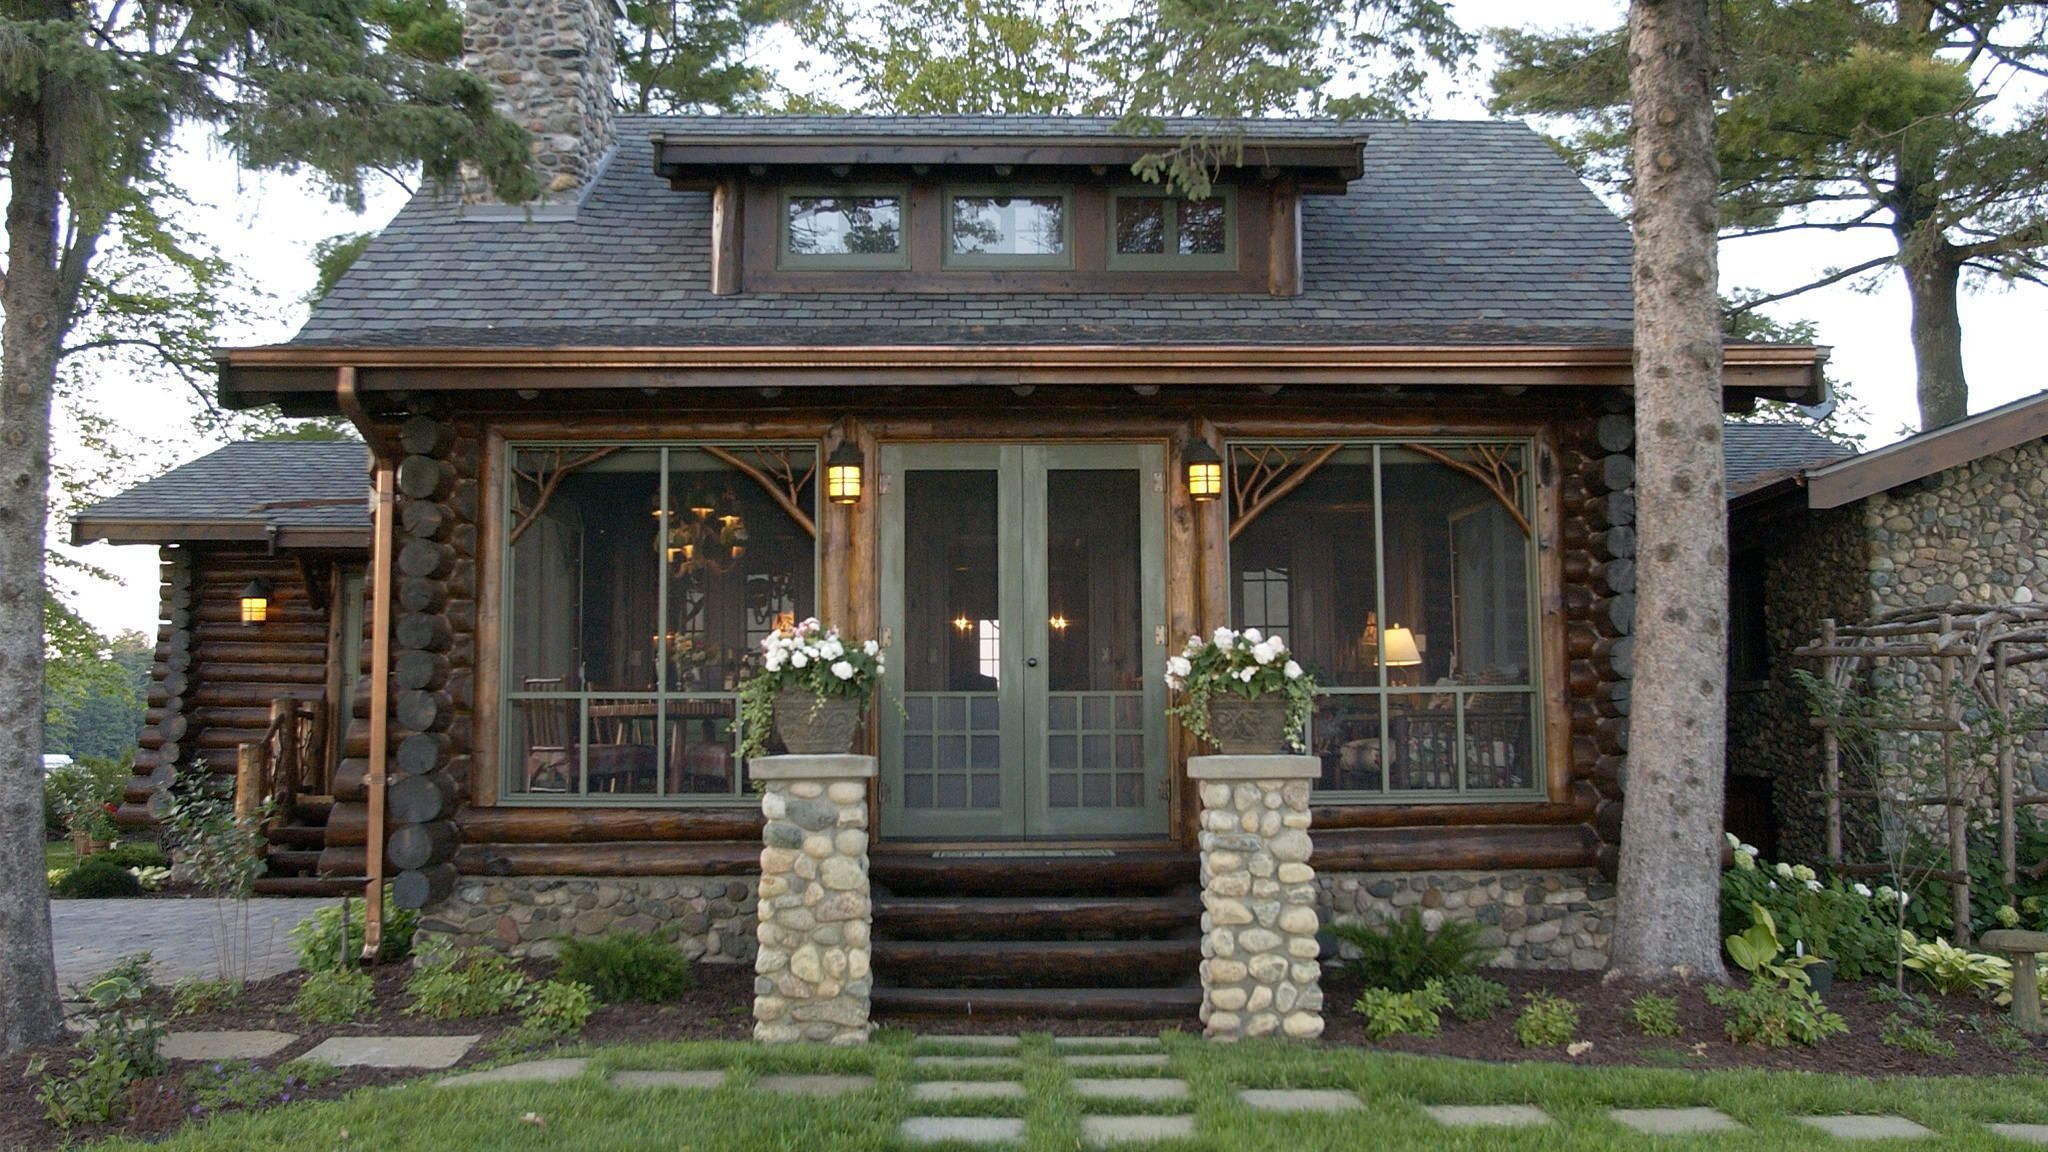 Bay Lake Lodge Exterior Entranceu2026LOVE the detail